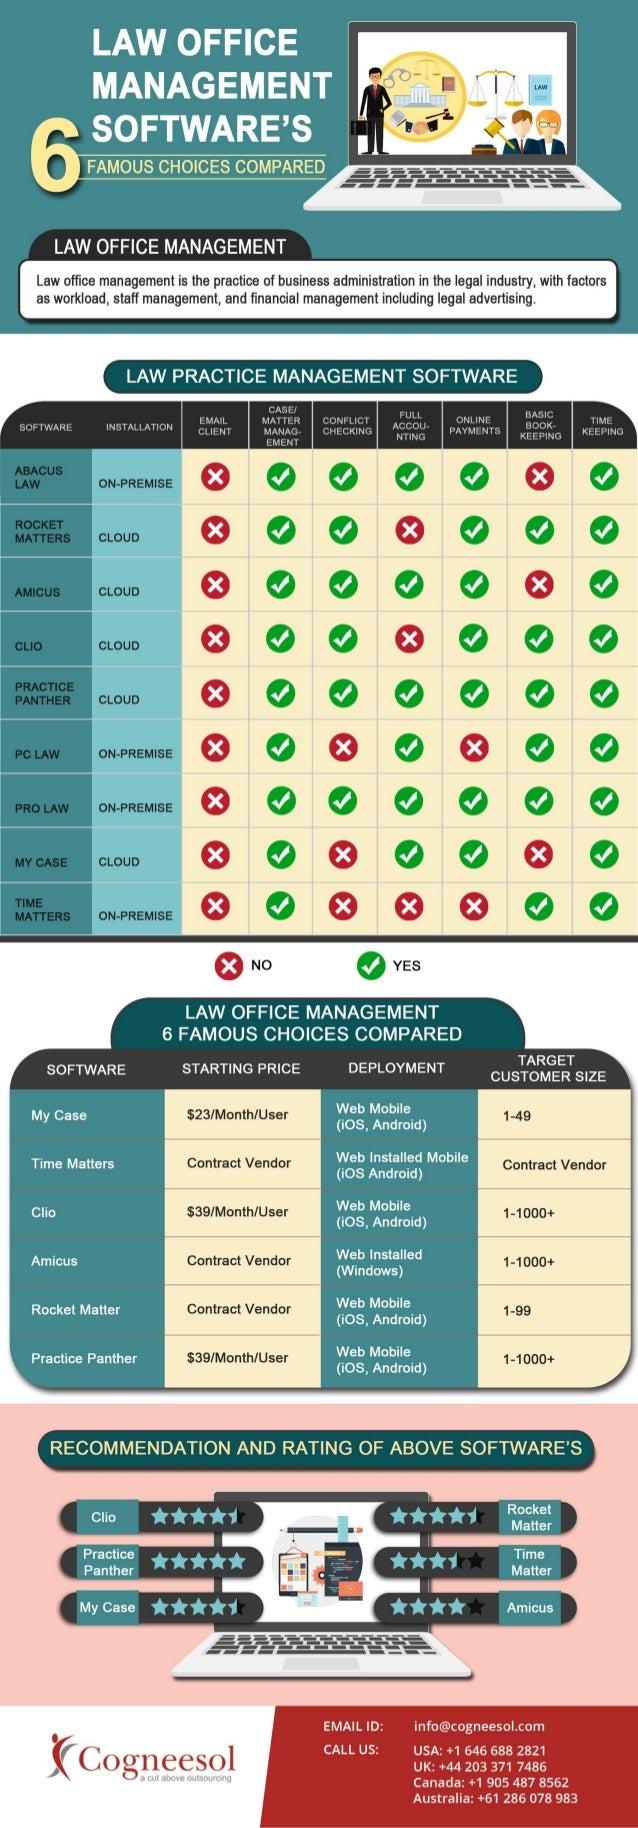 Law office management - Law Office Management Software